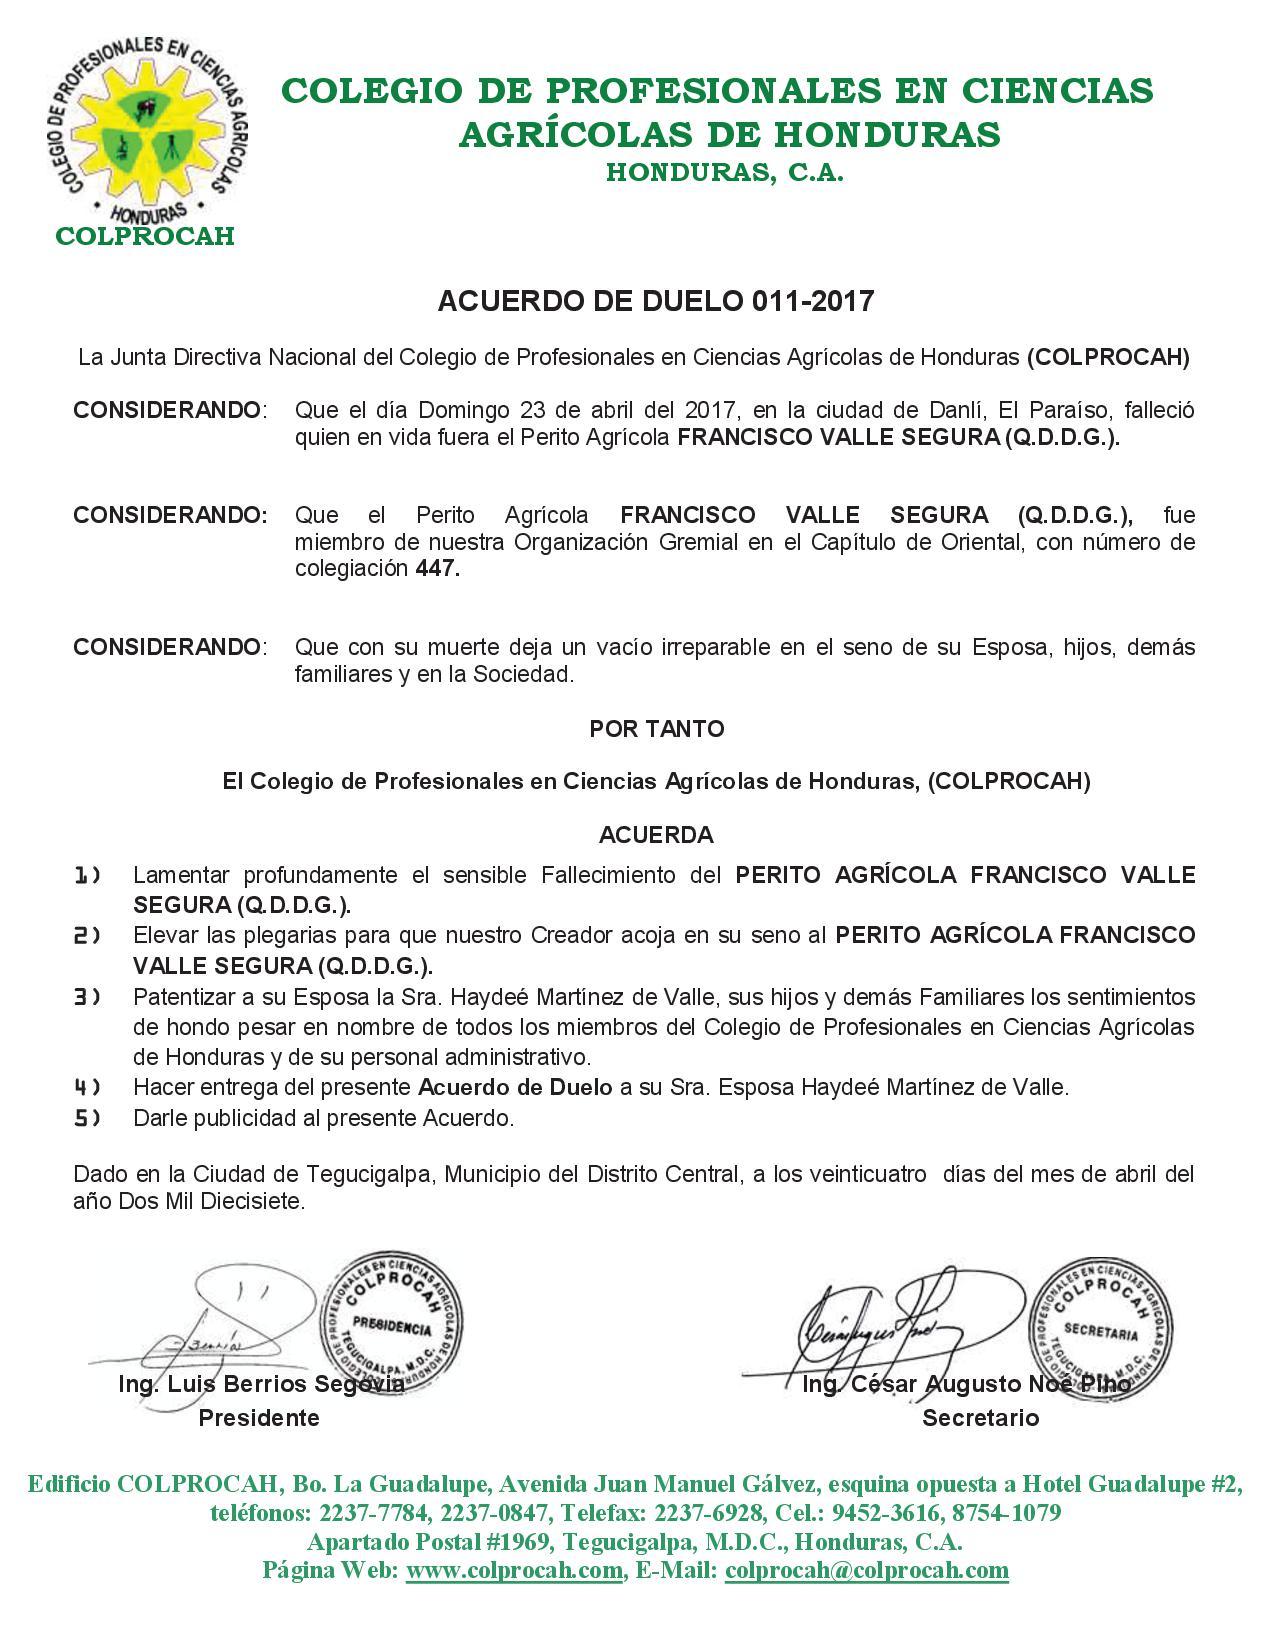 Acuerdo de Duelo 011-2017 FRANCISCO VALLE SEGURA